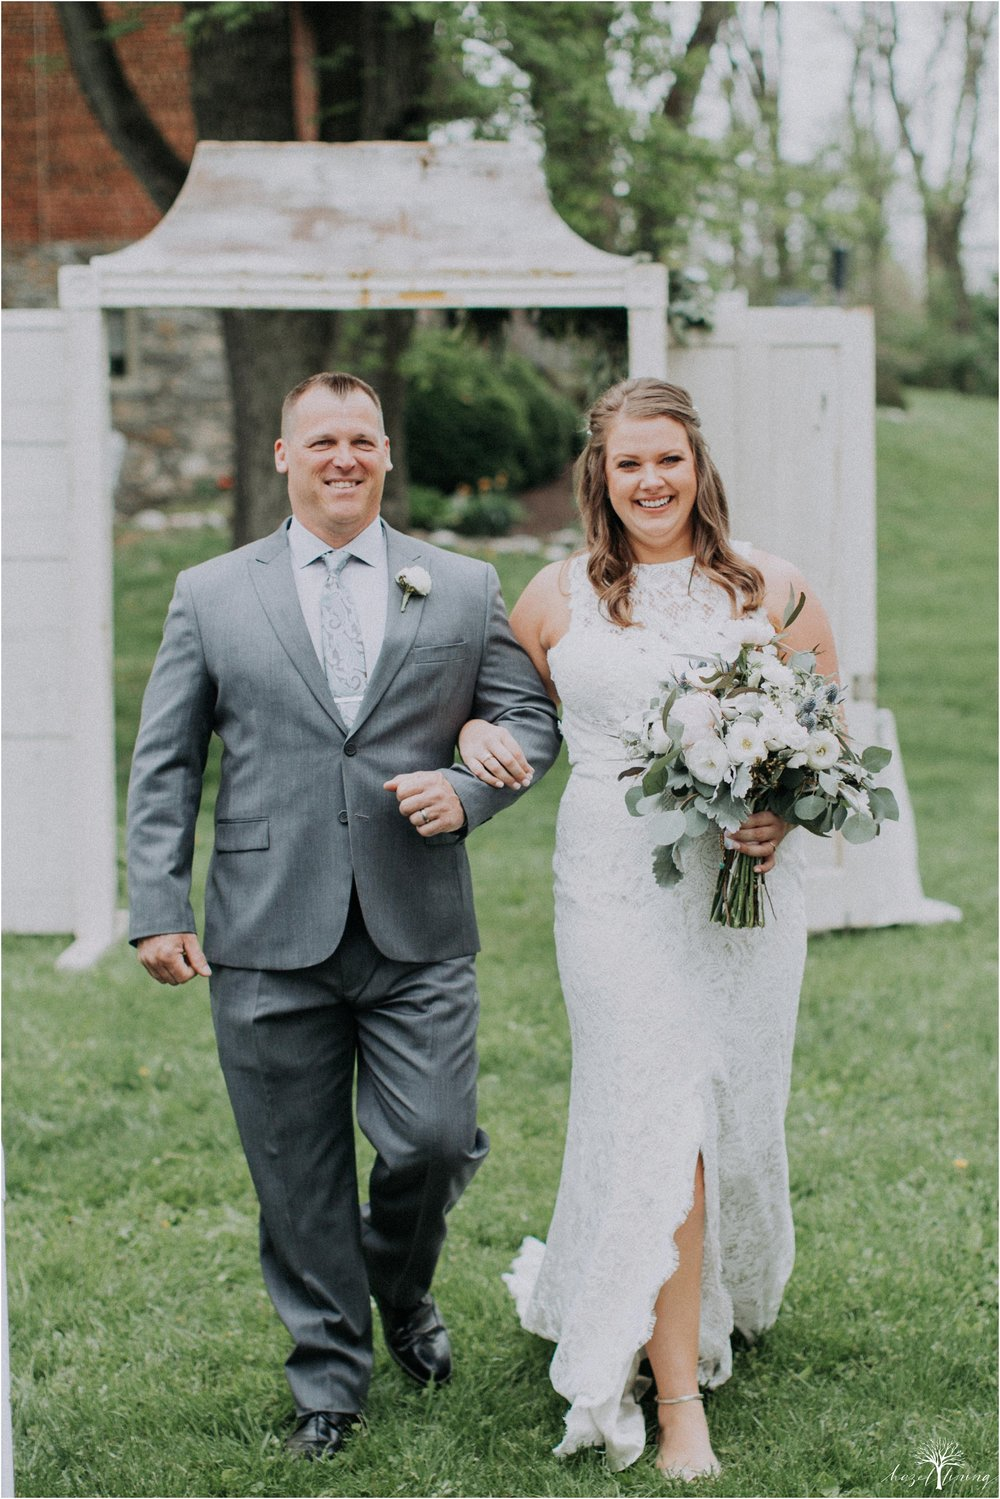 hazel-lining-travel-wedding-elopement-photography-abby-skyler-hunt-the-willis-house-york-pennsylvania-outdoor-estate-wedding_0080.jpg